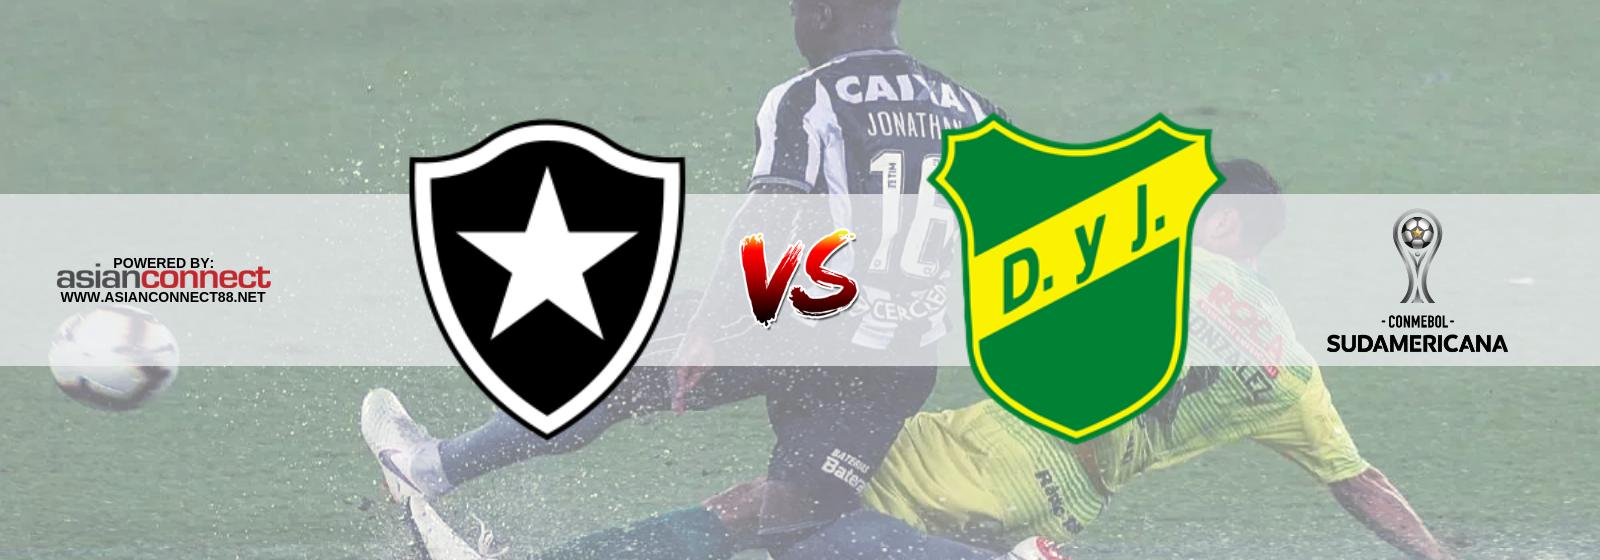 Copa Sudamericana: Defensa Justicia VS Botafogo